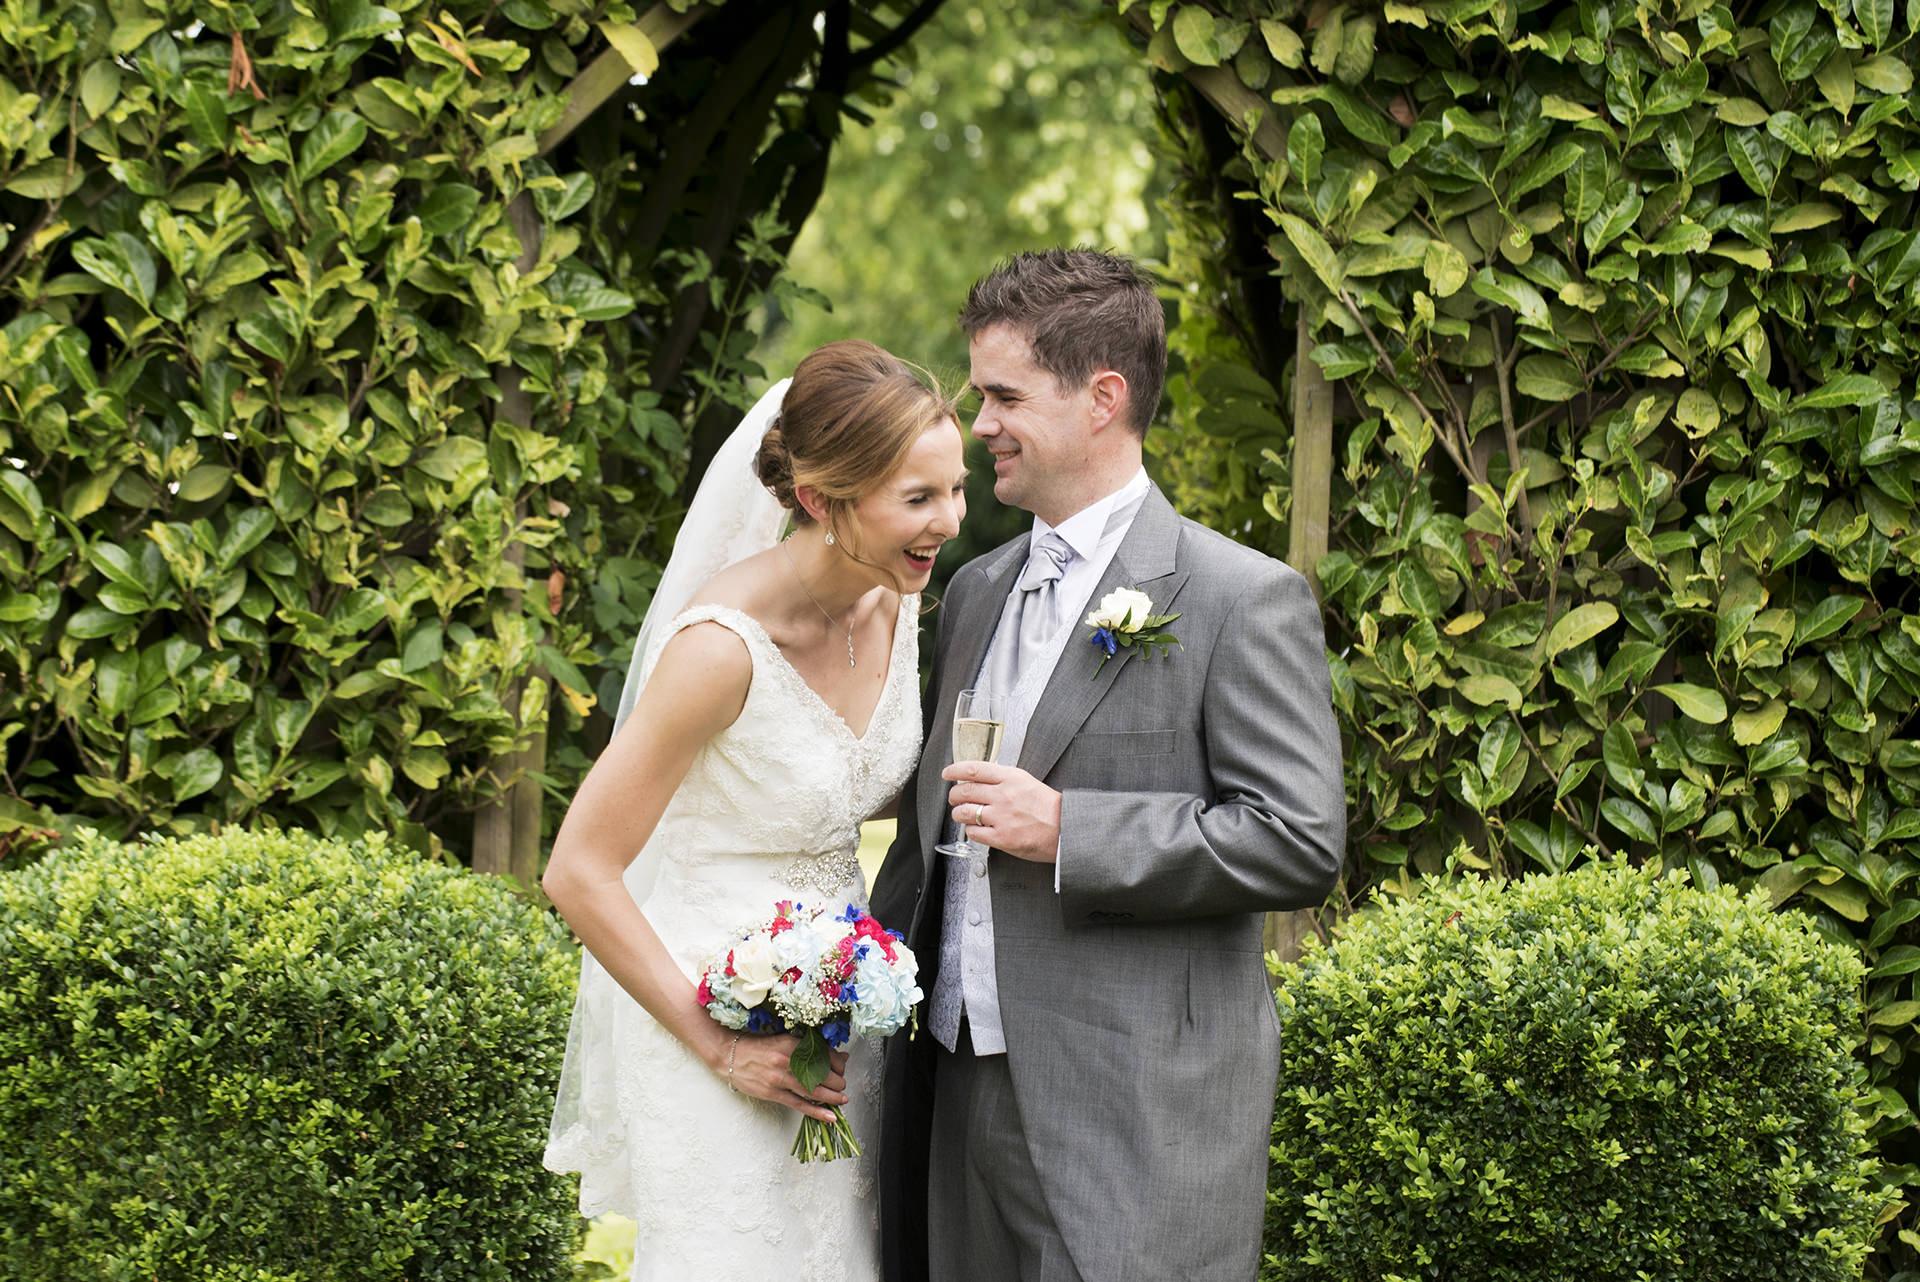 Wedding at Plum Park